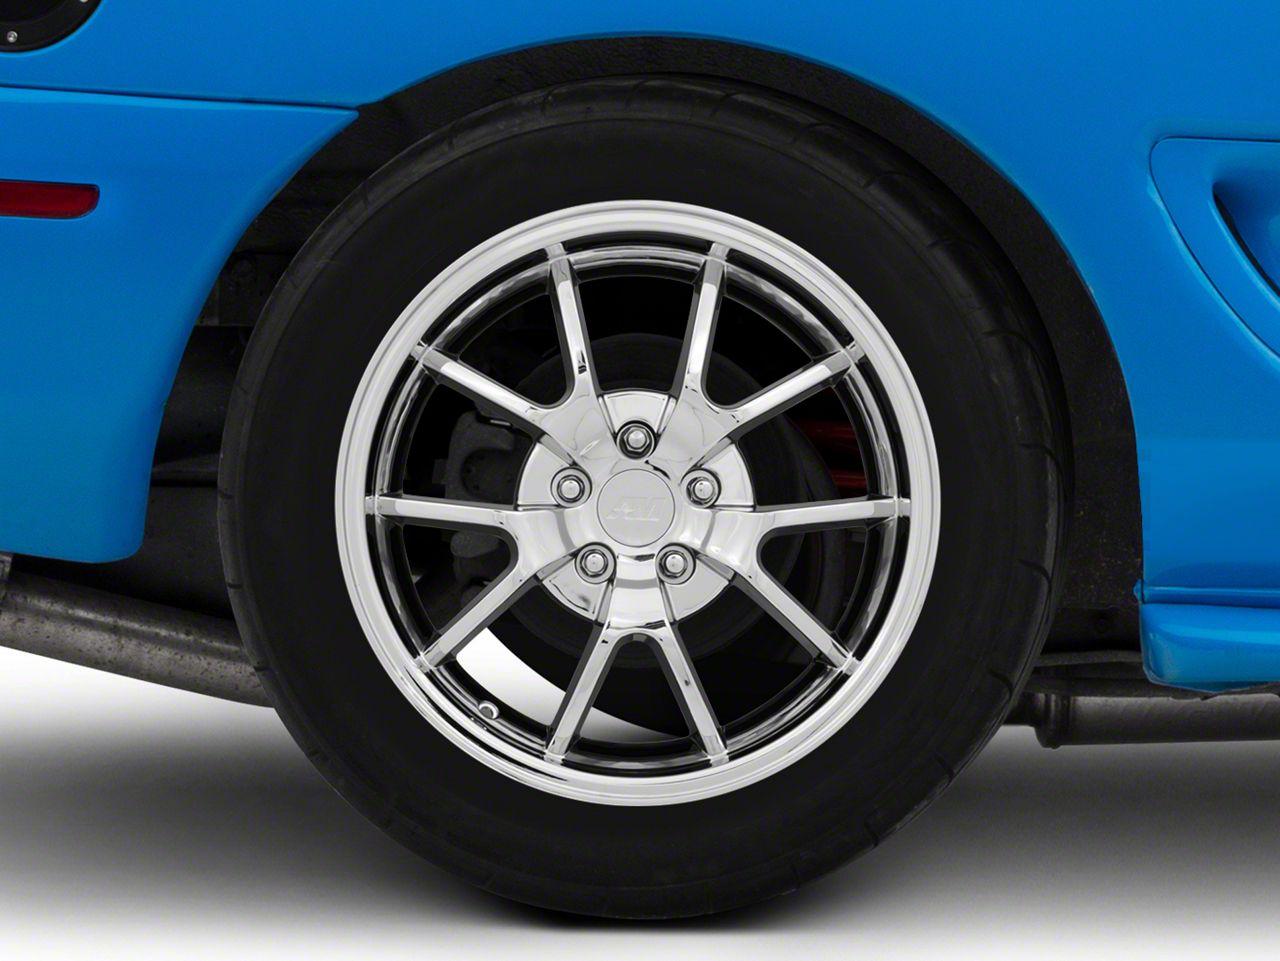 Deep Dish FR500 Style Chrome Wheel - 18x10 - Rear Only (94-04 All)